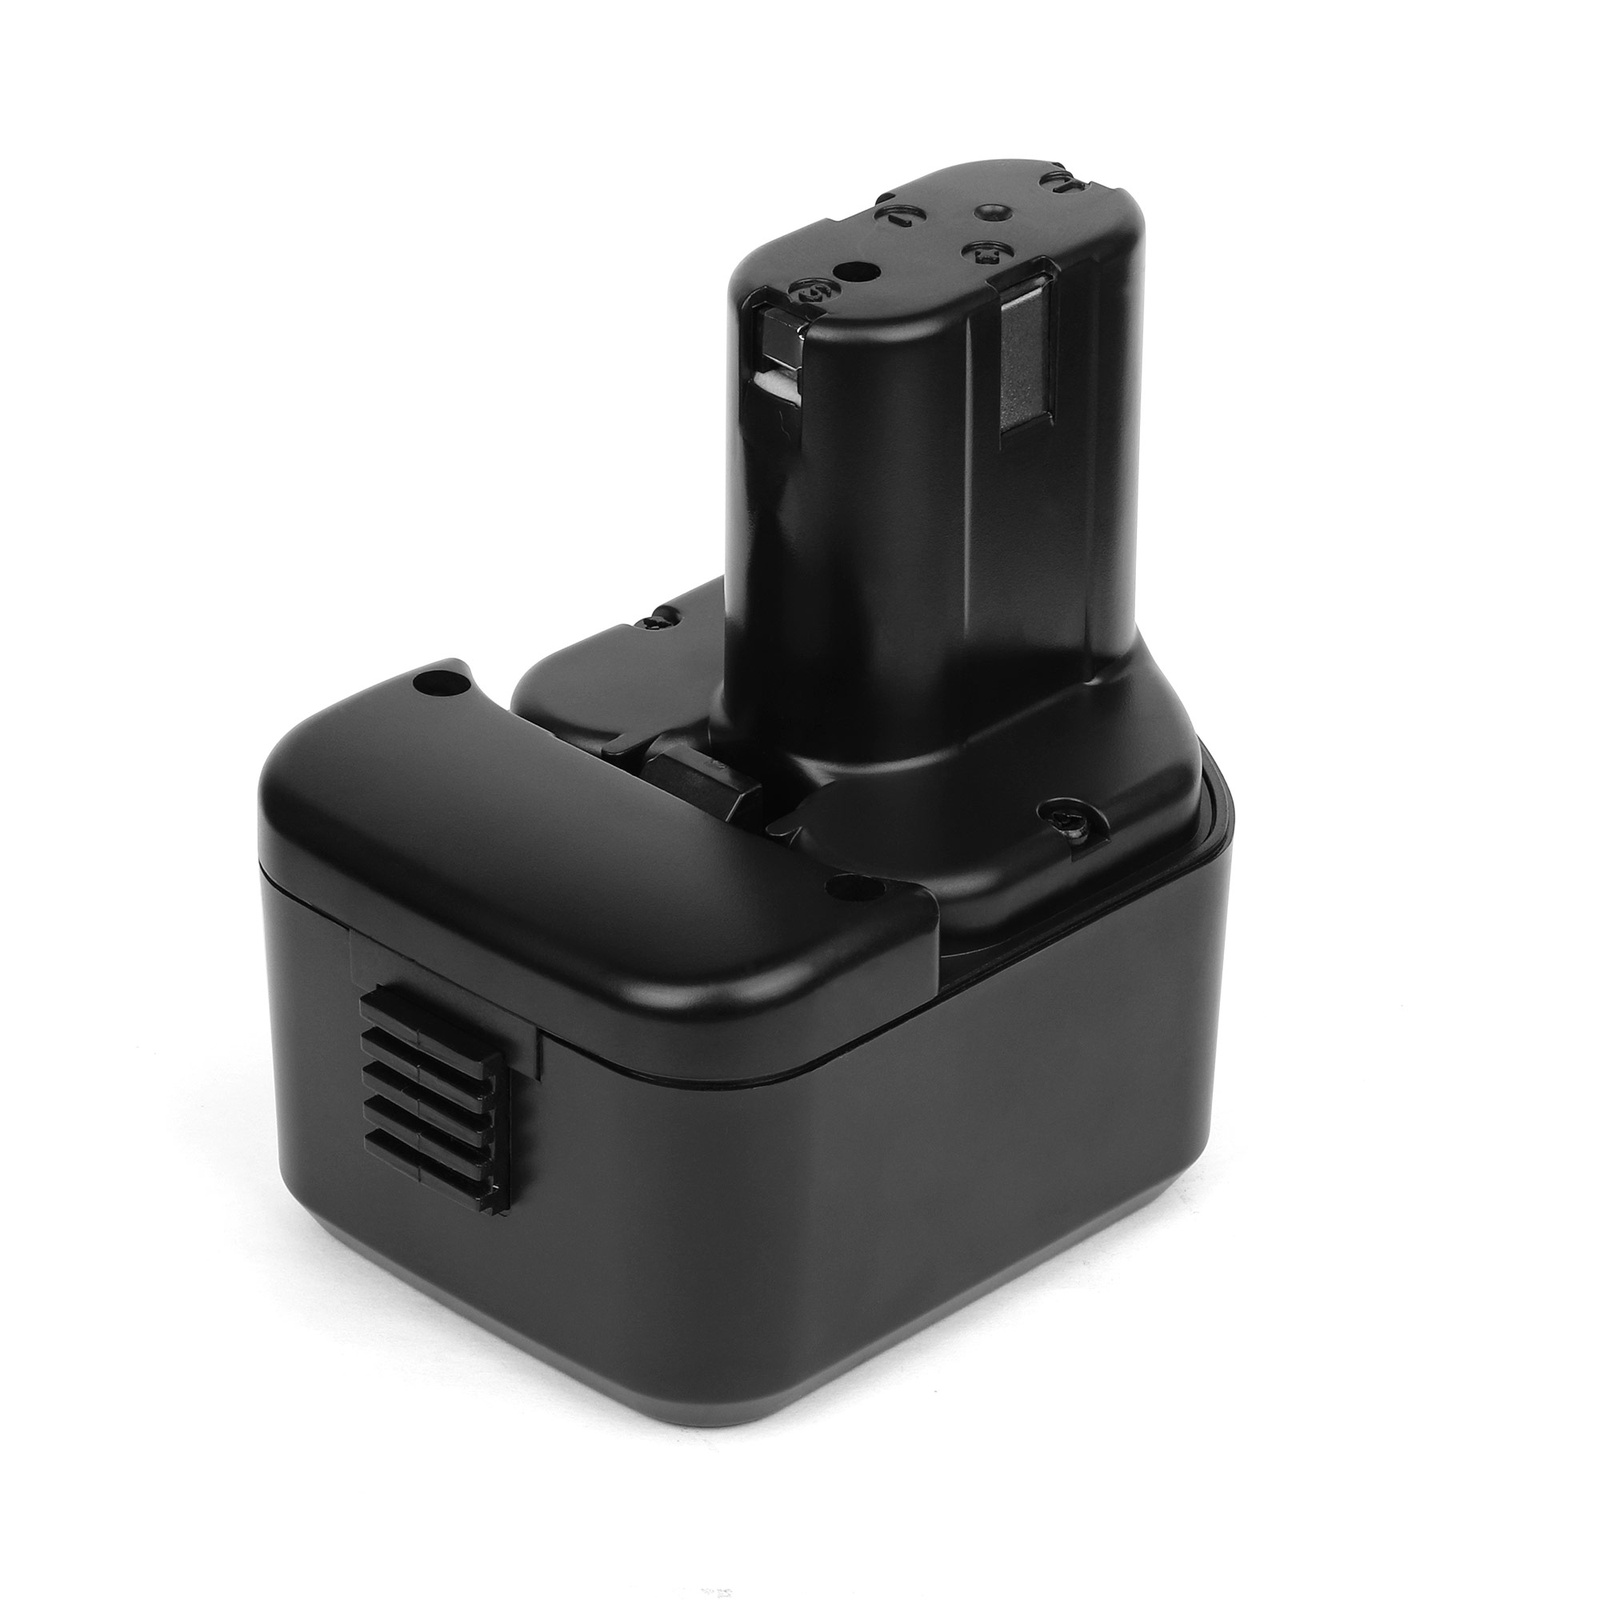 Аккумулятор для инструмента TopON TOP-PTGD-HIT-12(B) ниссей манжета cuff ds 1862 к тонометру модели ds 1862